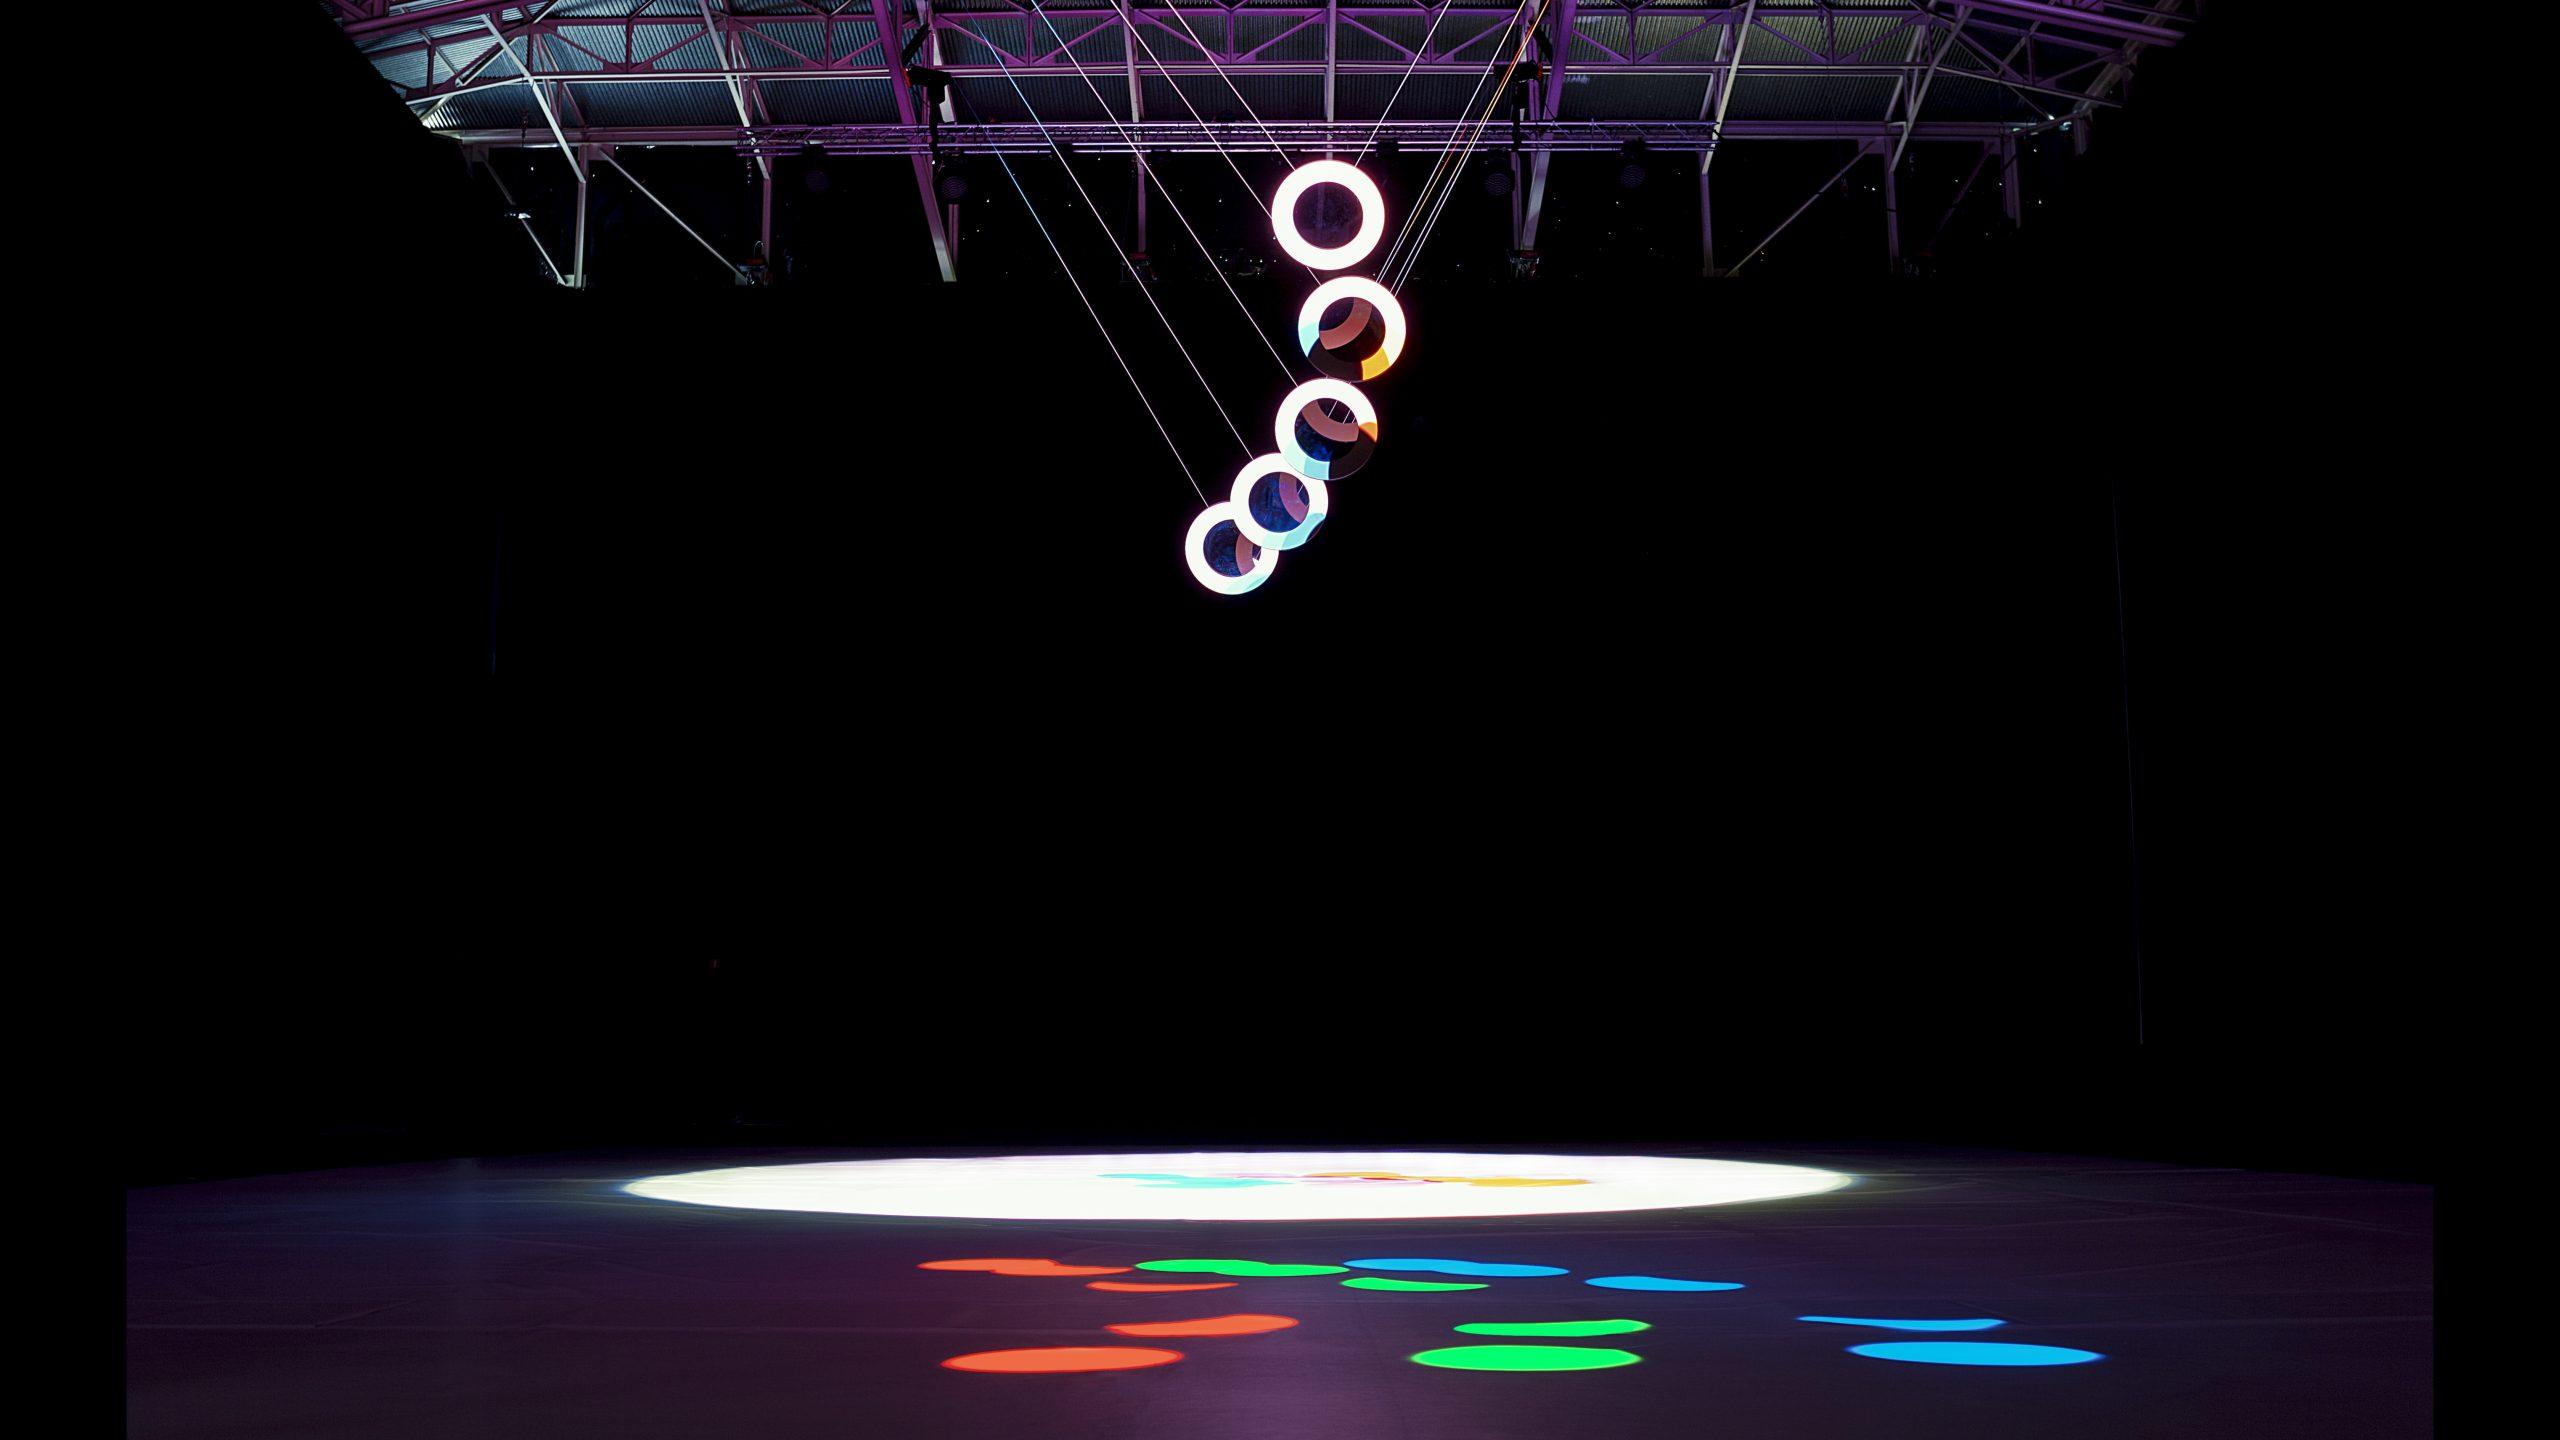 RGB|CMY KINETIC